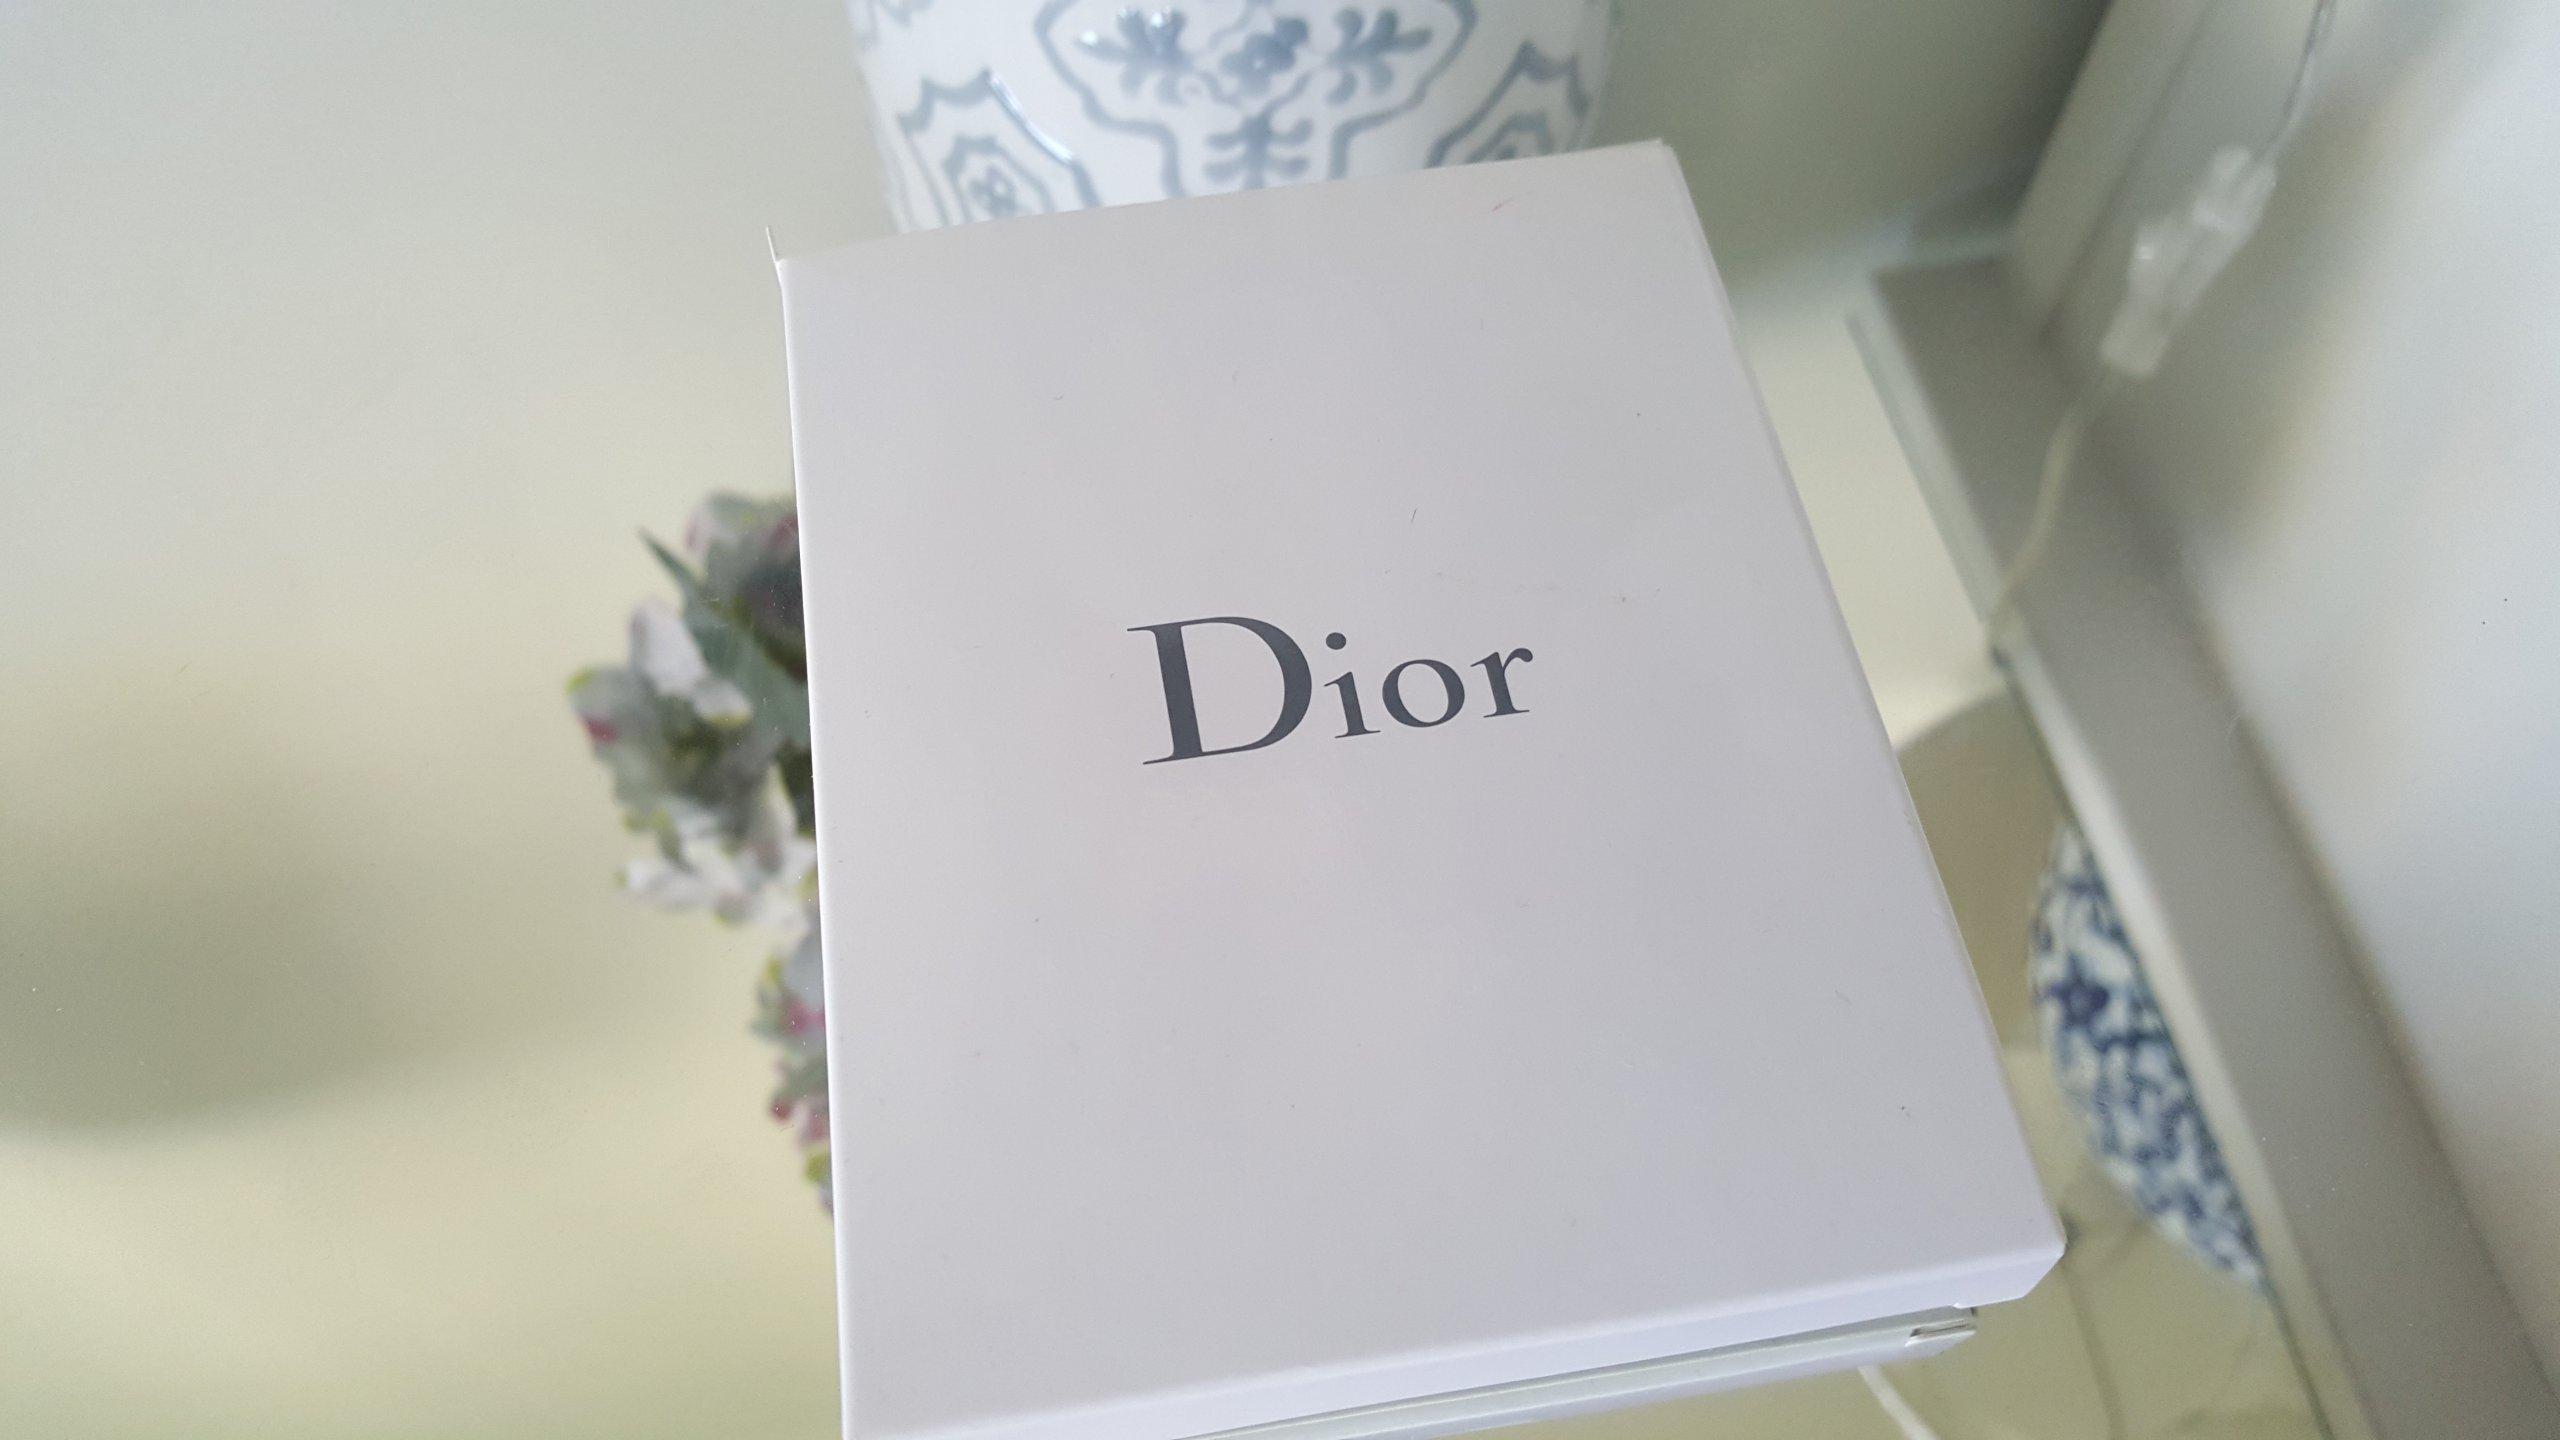 d224427d9ddda torebki?brand=christian dior w Oficjalnym Archiwum Allegro - archiwum ofert